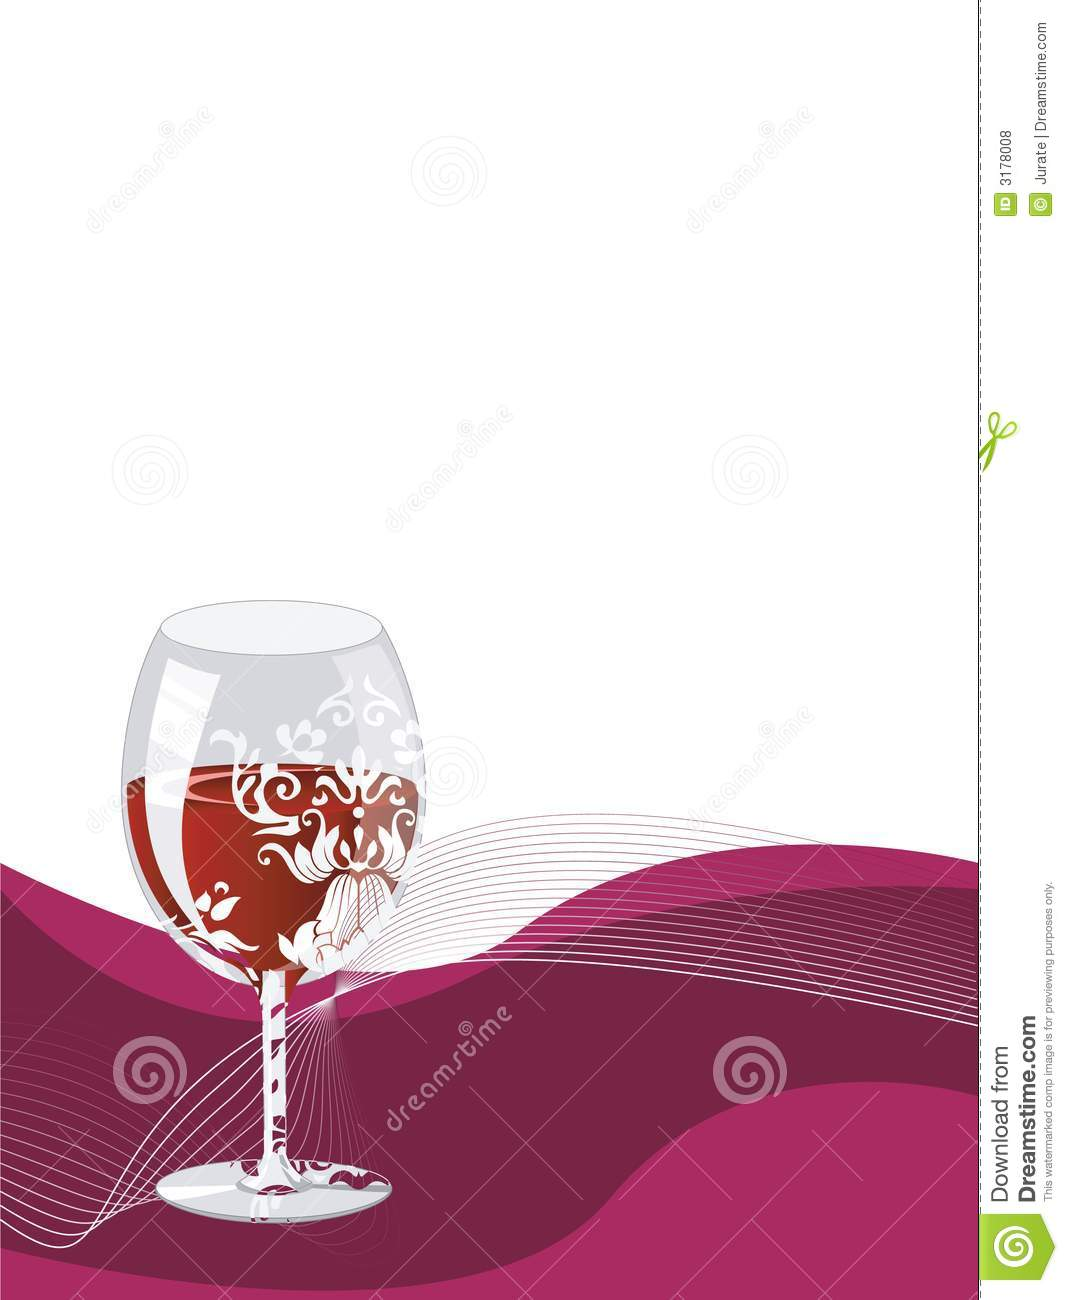 Wine Party Invitation Mickey Mouse Invitations Templates - Wine and cheese party invitation template free